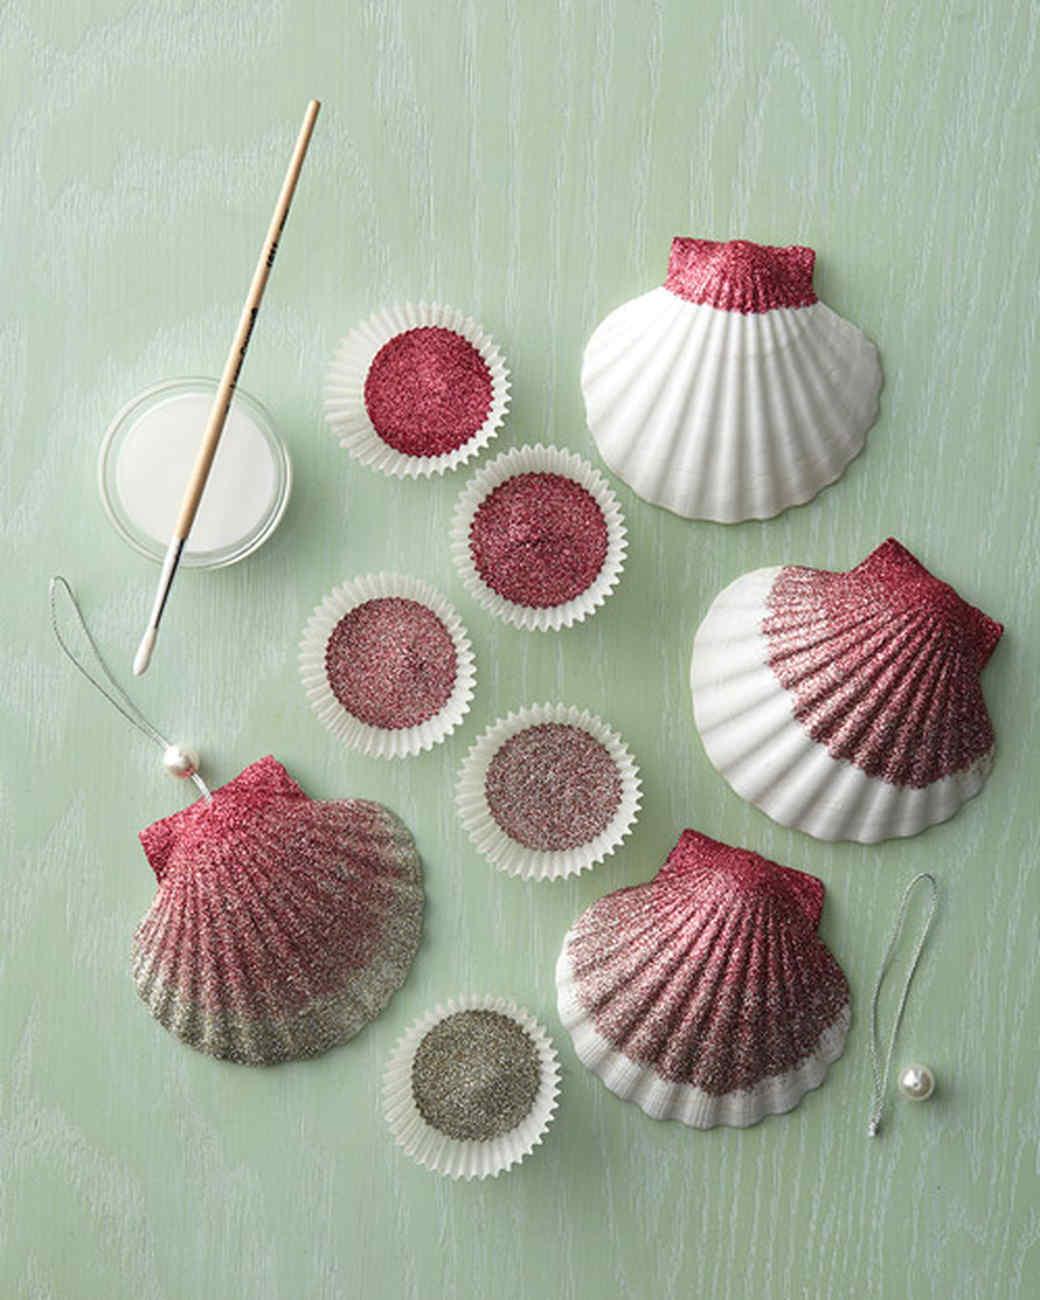 Ombre Glittered Seashell Ornaments & Video | Martha Stewart